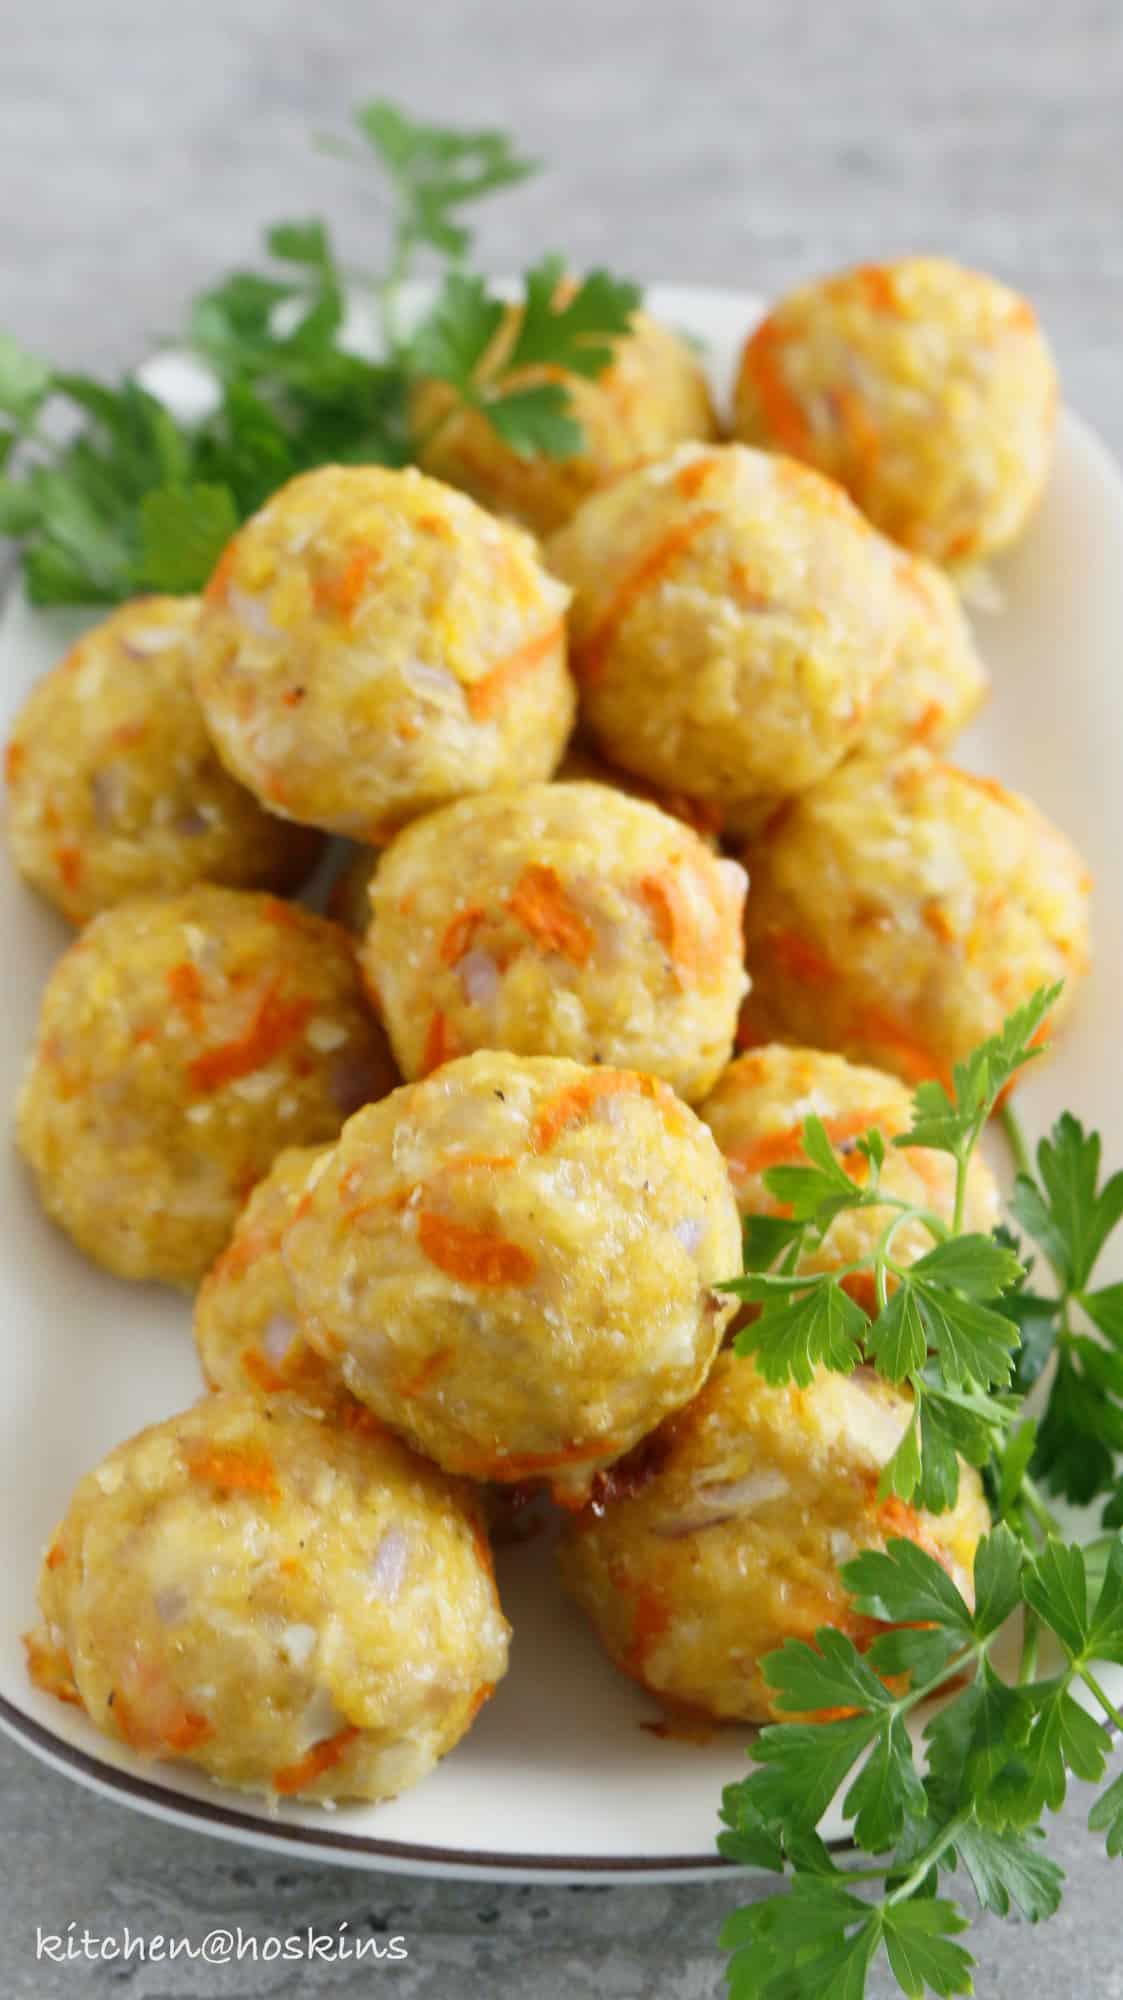 healthyish baked chicken meatballs